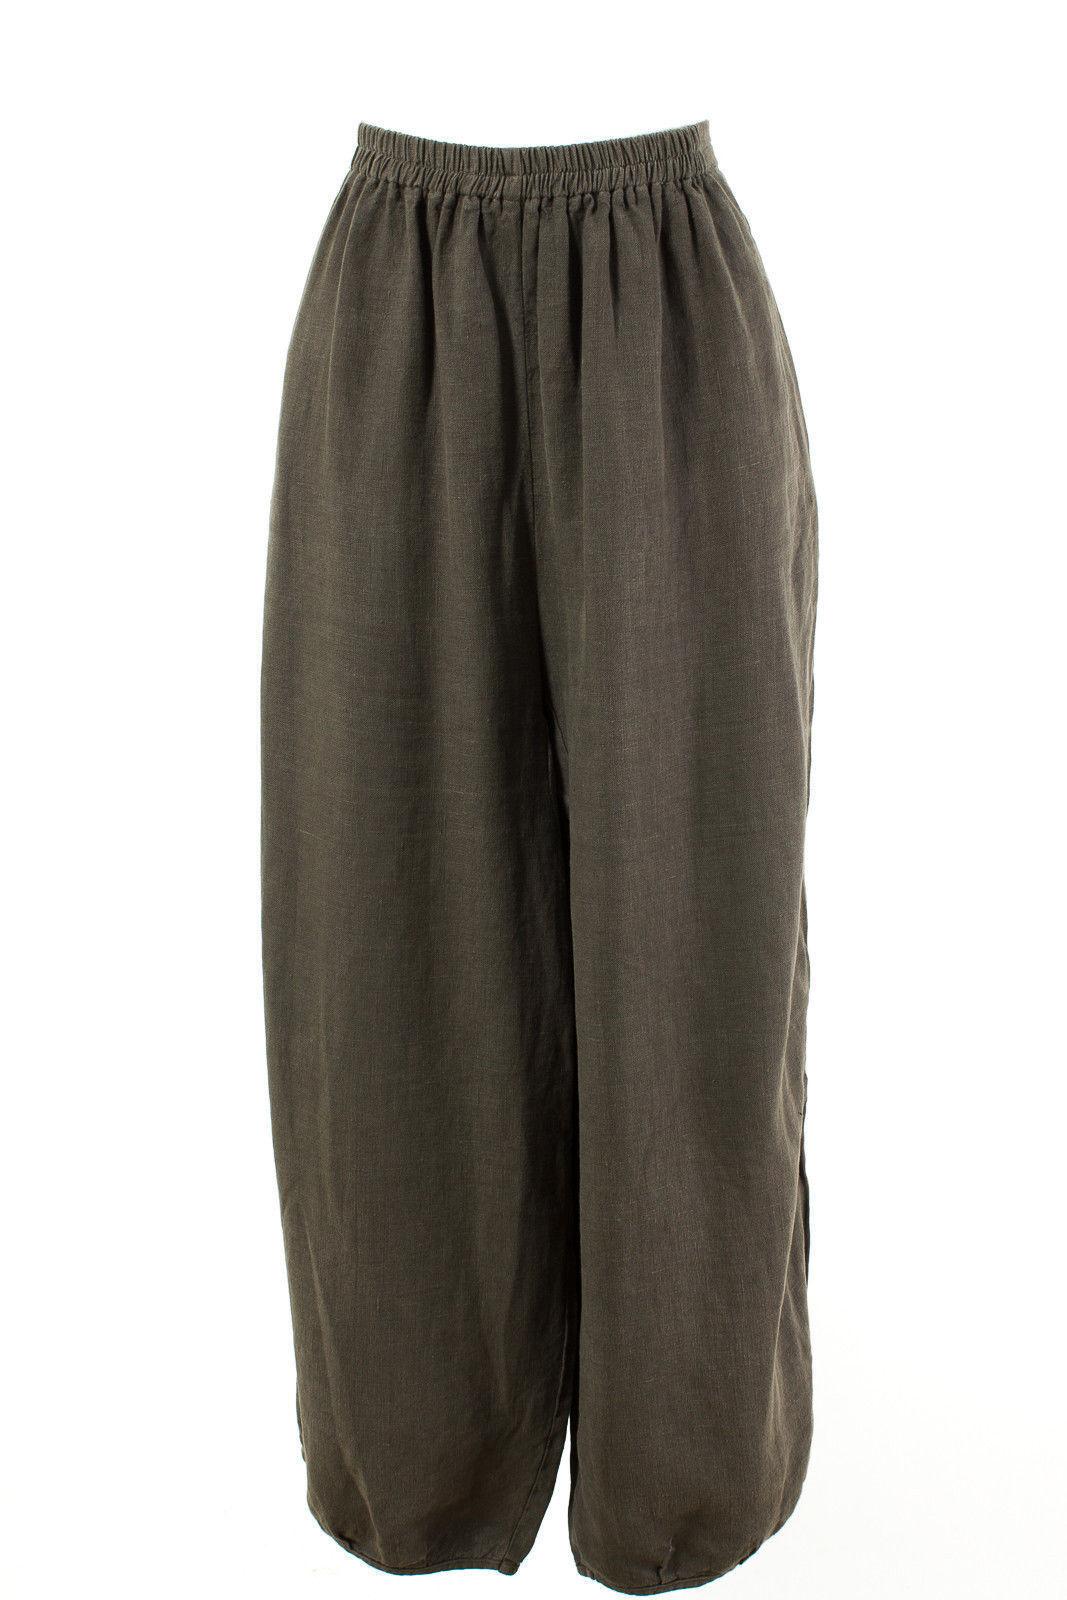 Kandis & Kandis Man Trousers Größe 3 = de 38 M 100% Linen Wide Leg Lagenlook Hose